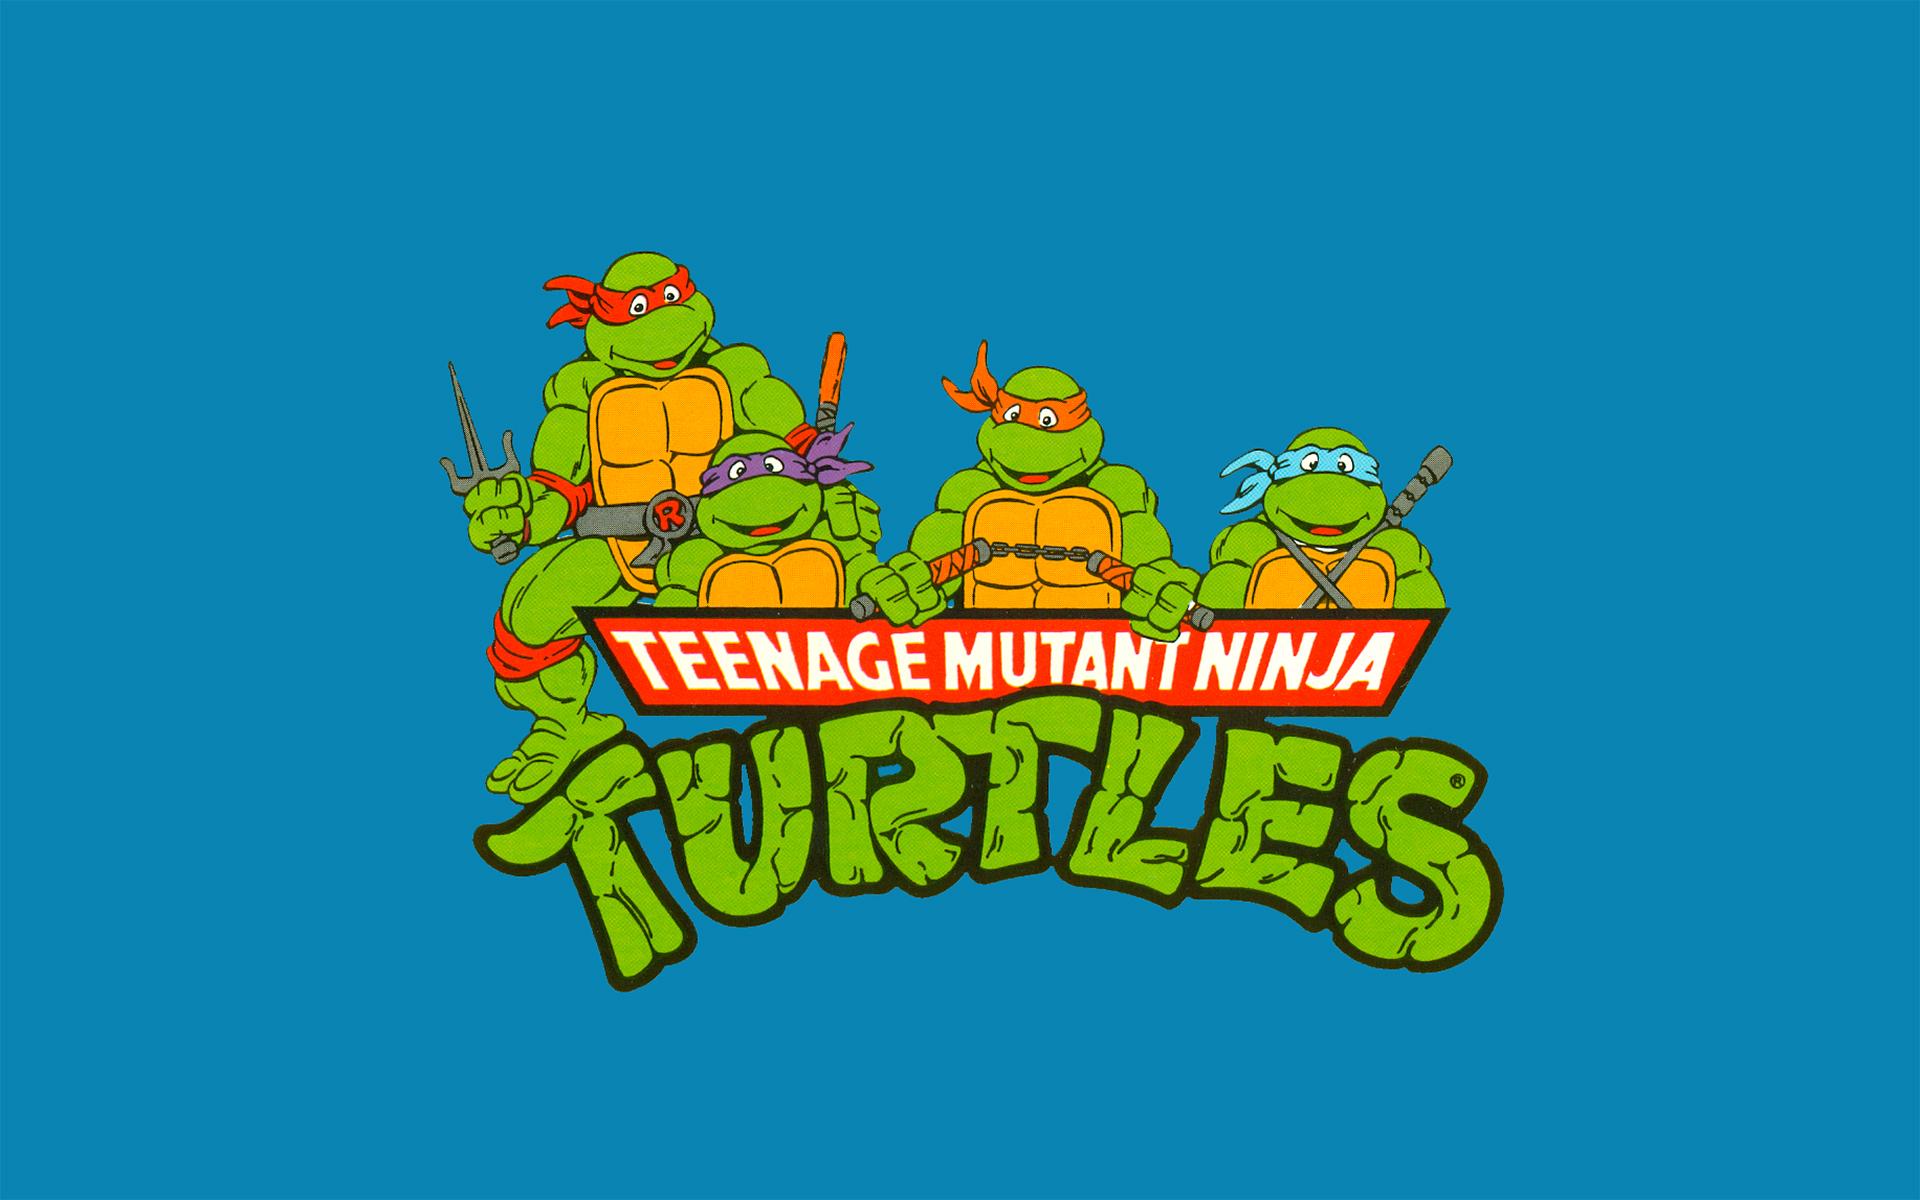 teenage mutant ninja turtles wallpaper (38 wallpapers) – adorable